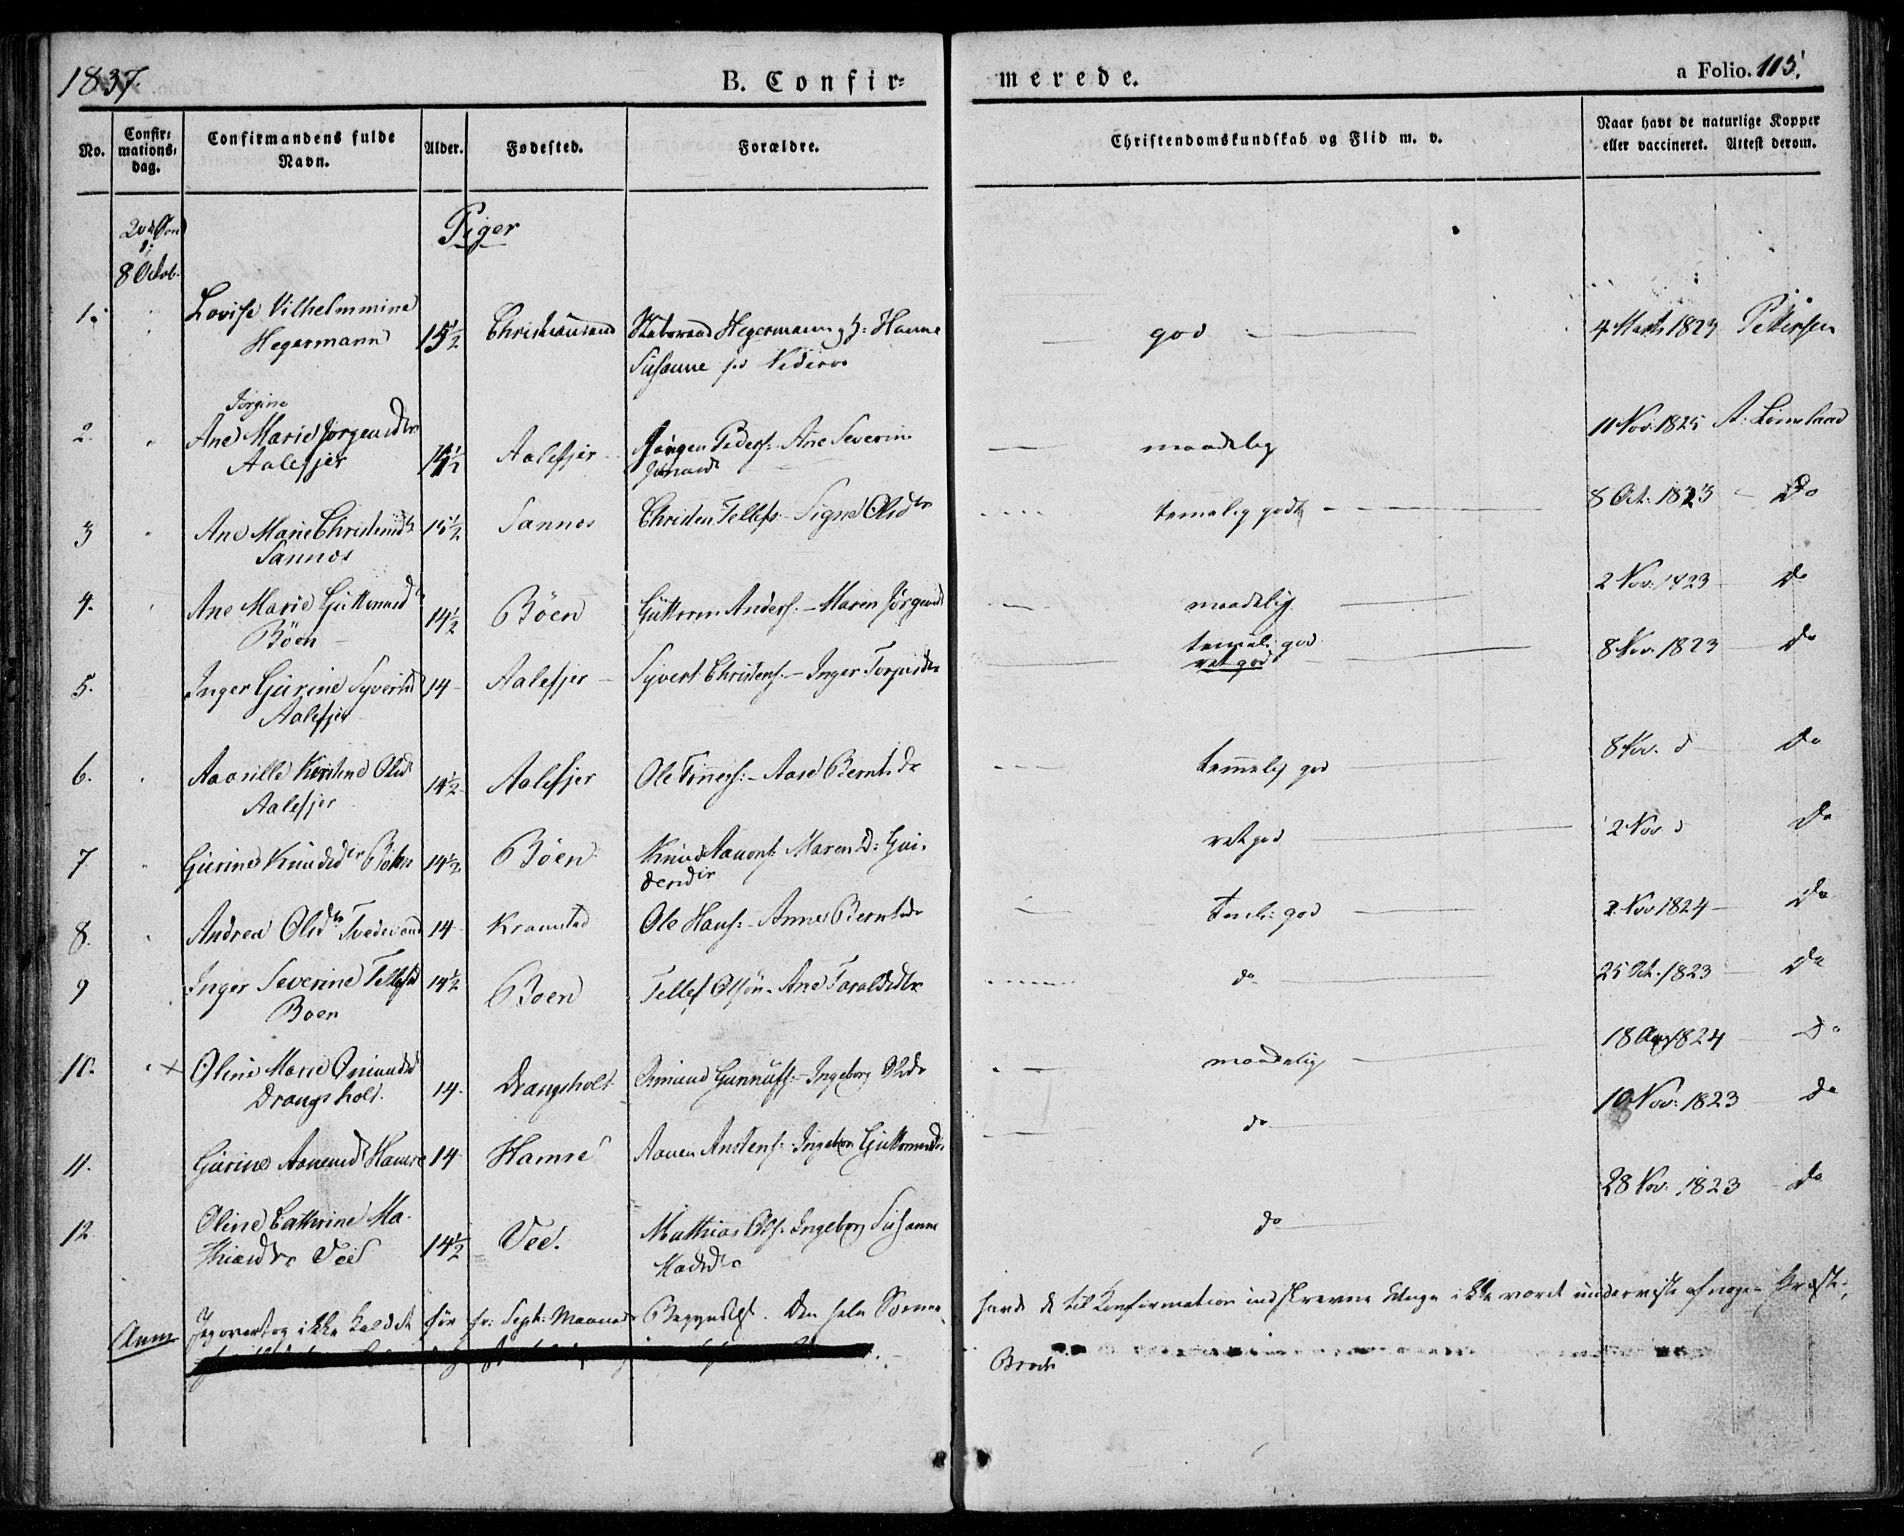 SAK, Tveit sokneprestkontor, F/Fa/L0003: Ministerialbok nr. A 3, 1829-1852, s. 115